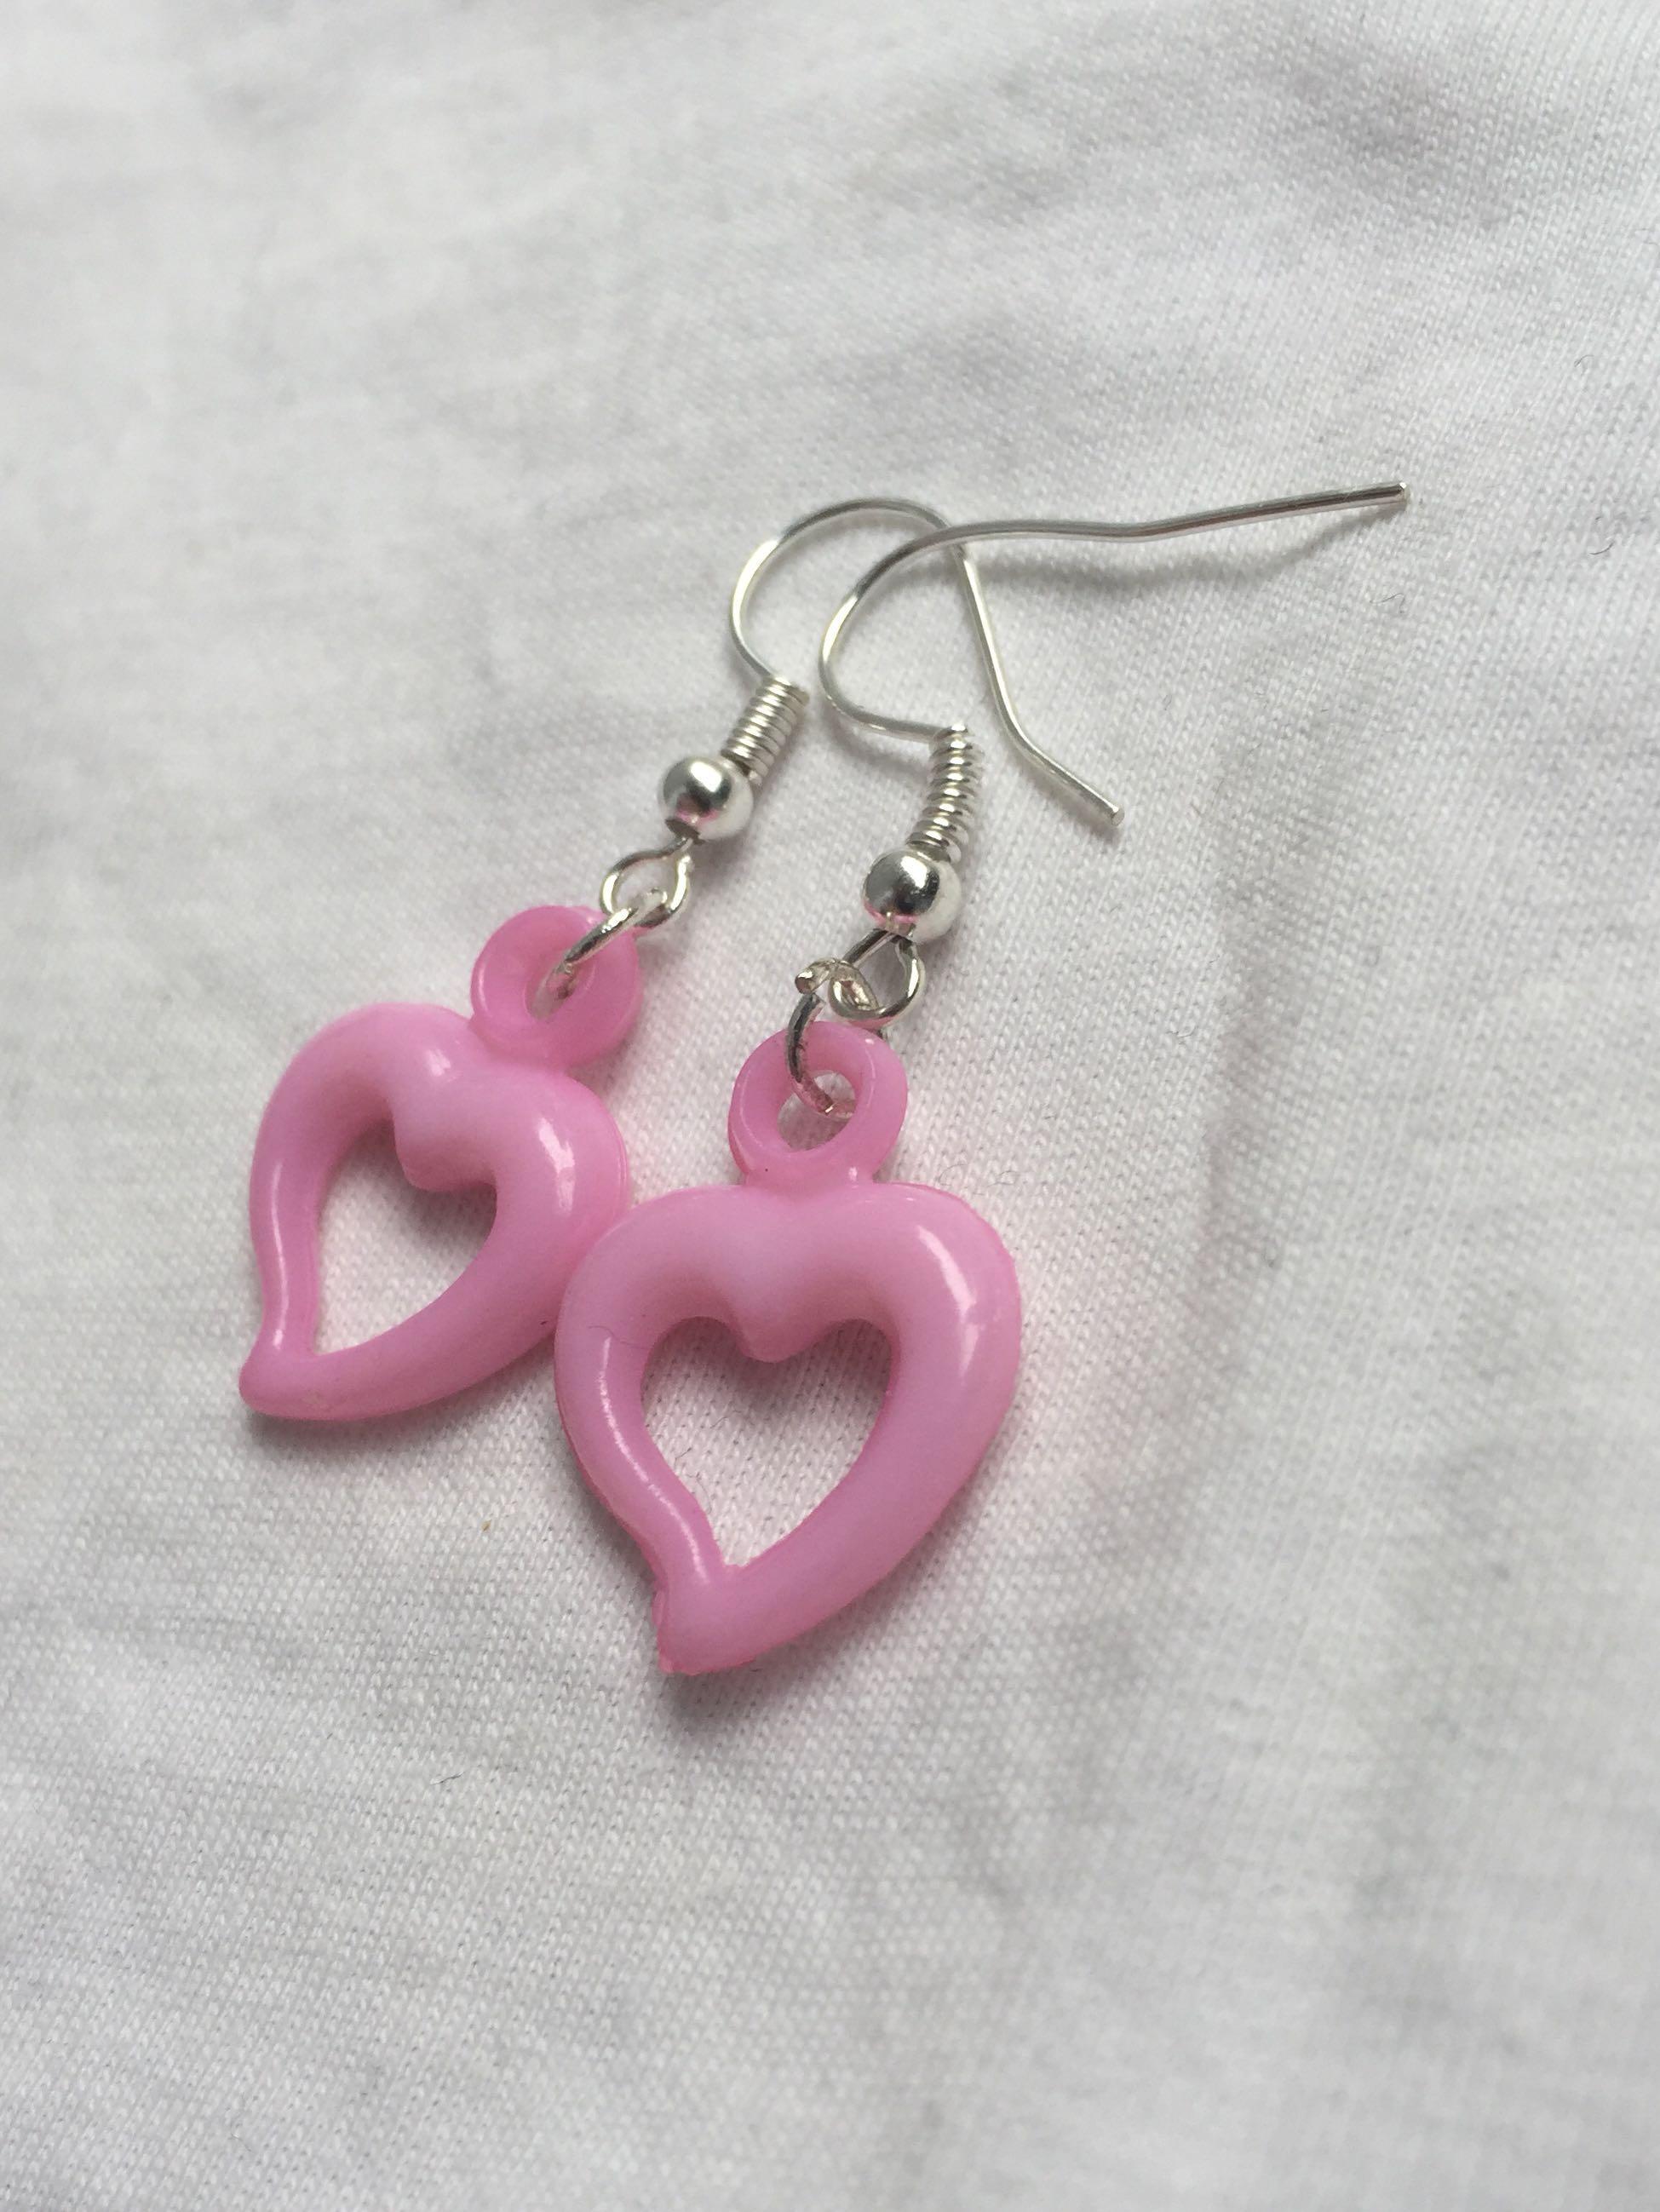 Handmade y2k Kawaii egirl baby pink love heart earrings